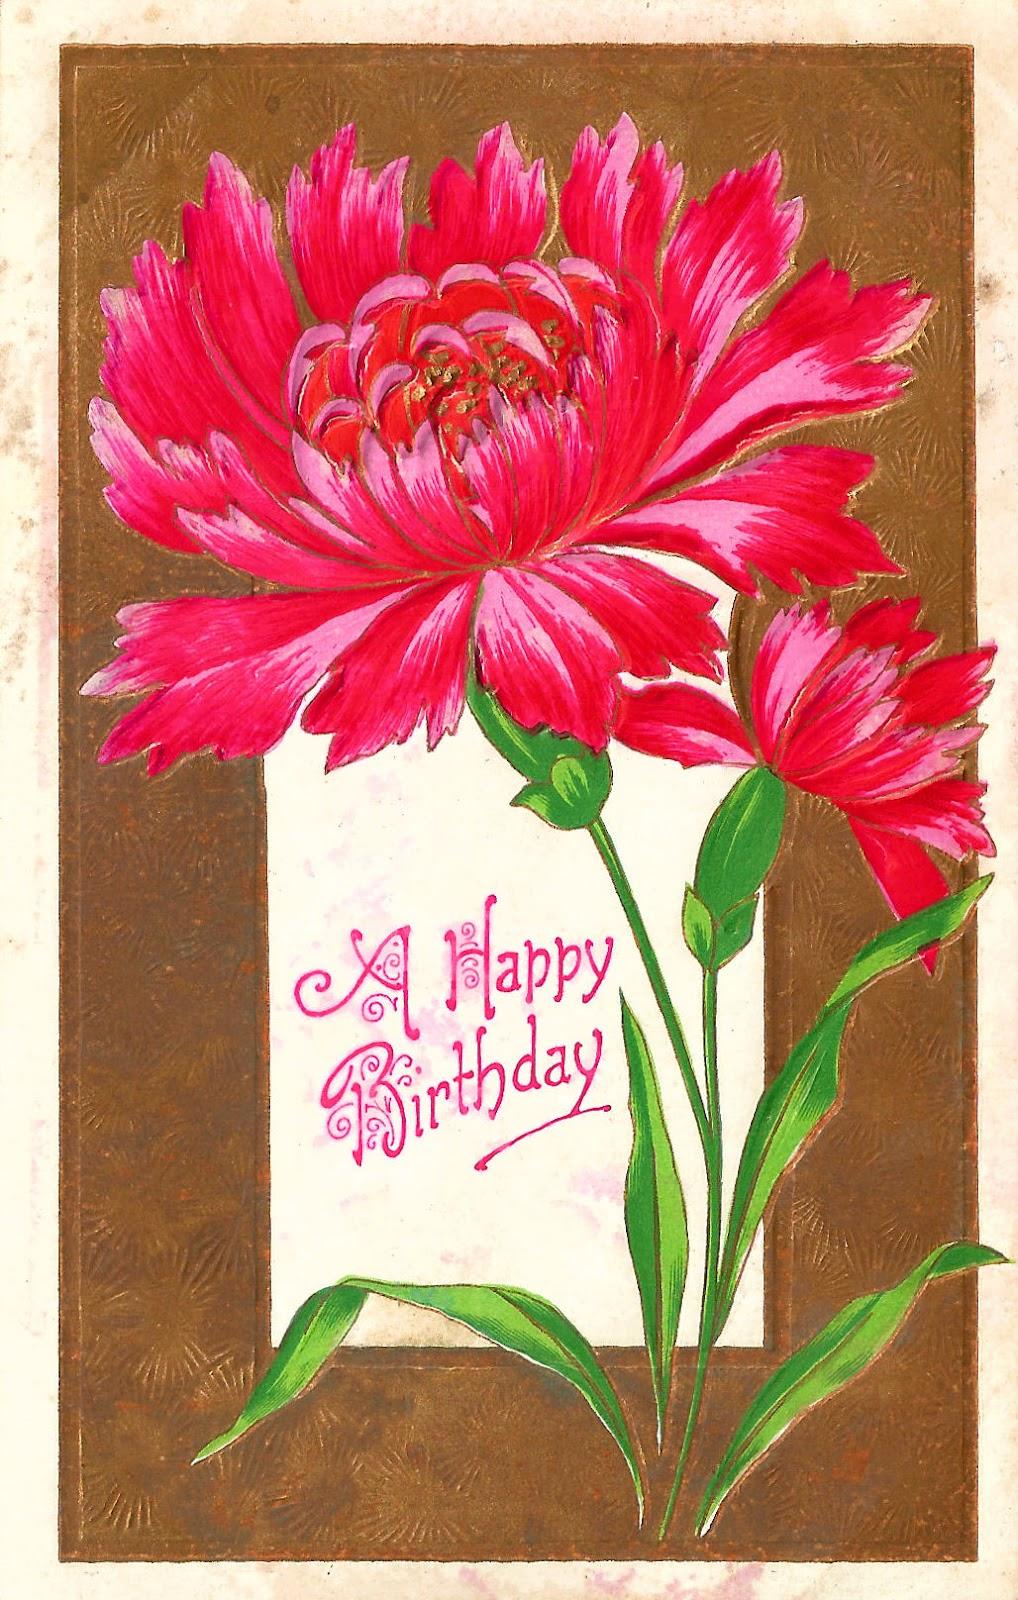 Vintage Flower clipart vintage birthday #11